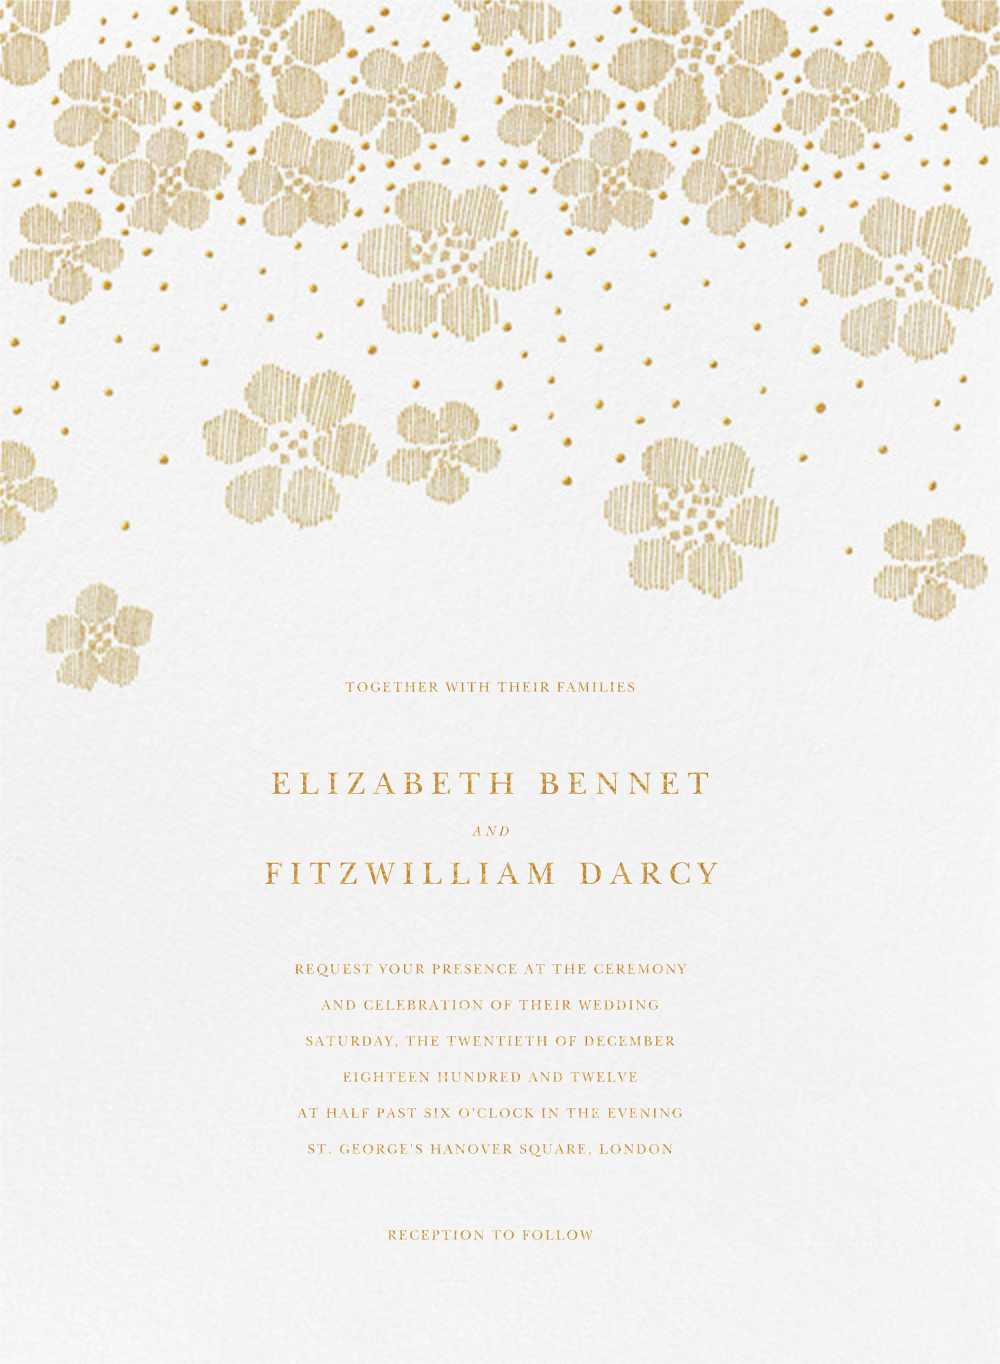 Blossoms on Tulle II - Medium Gold - Oscar de la Renta